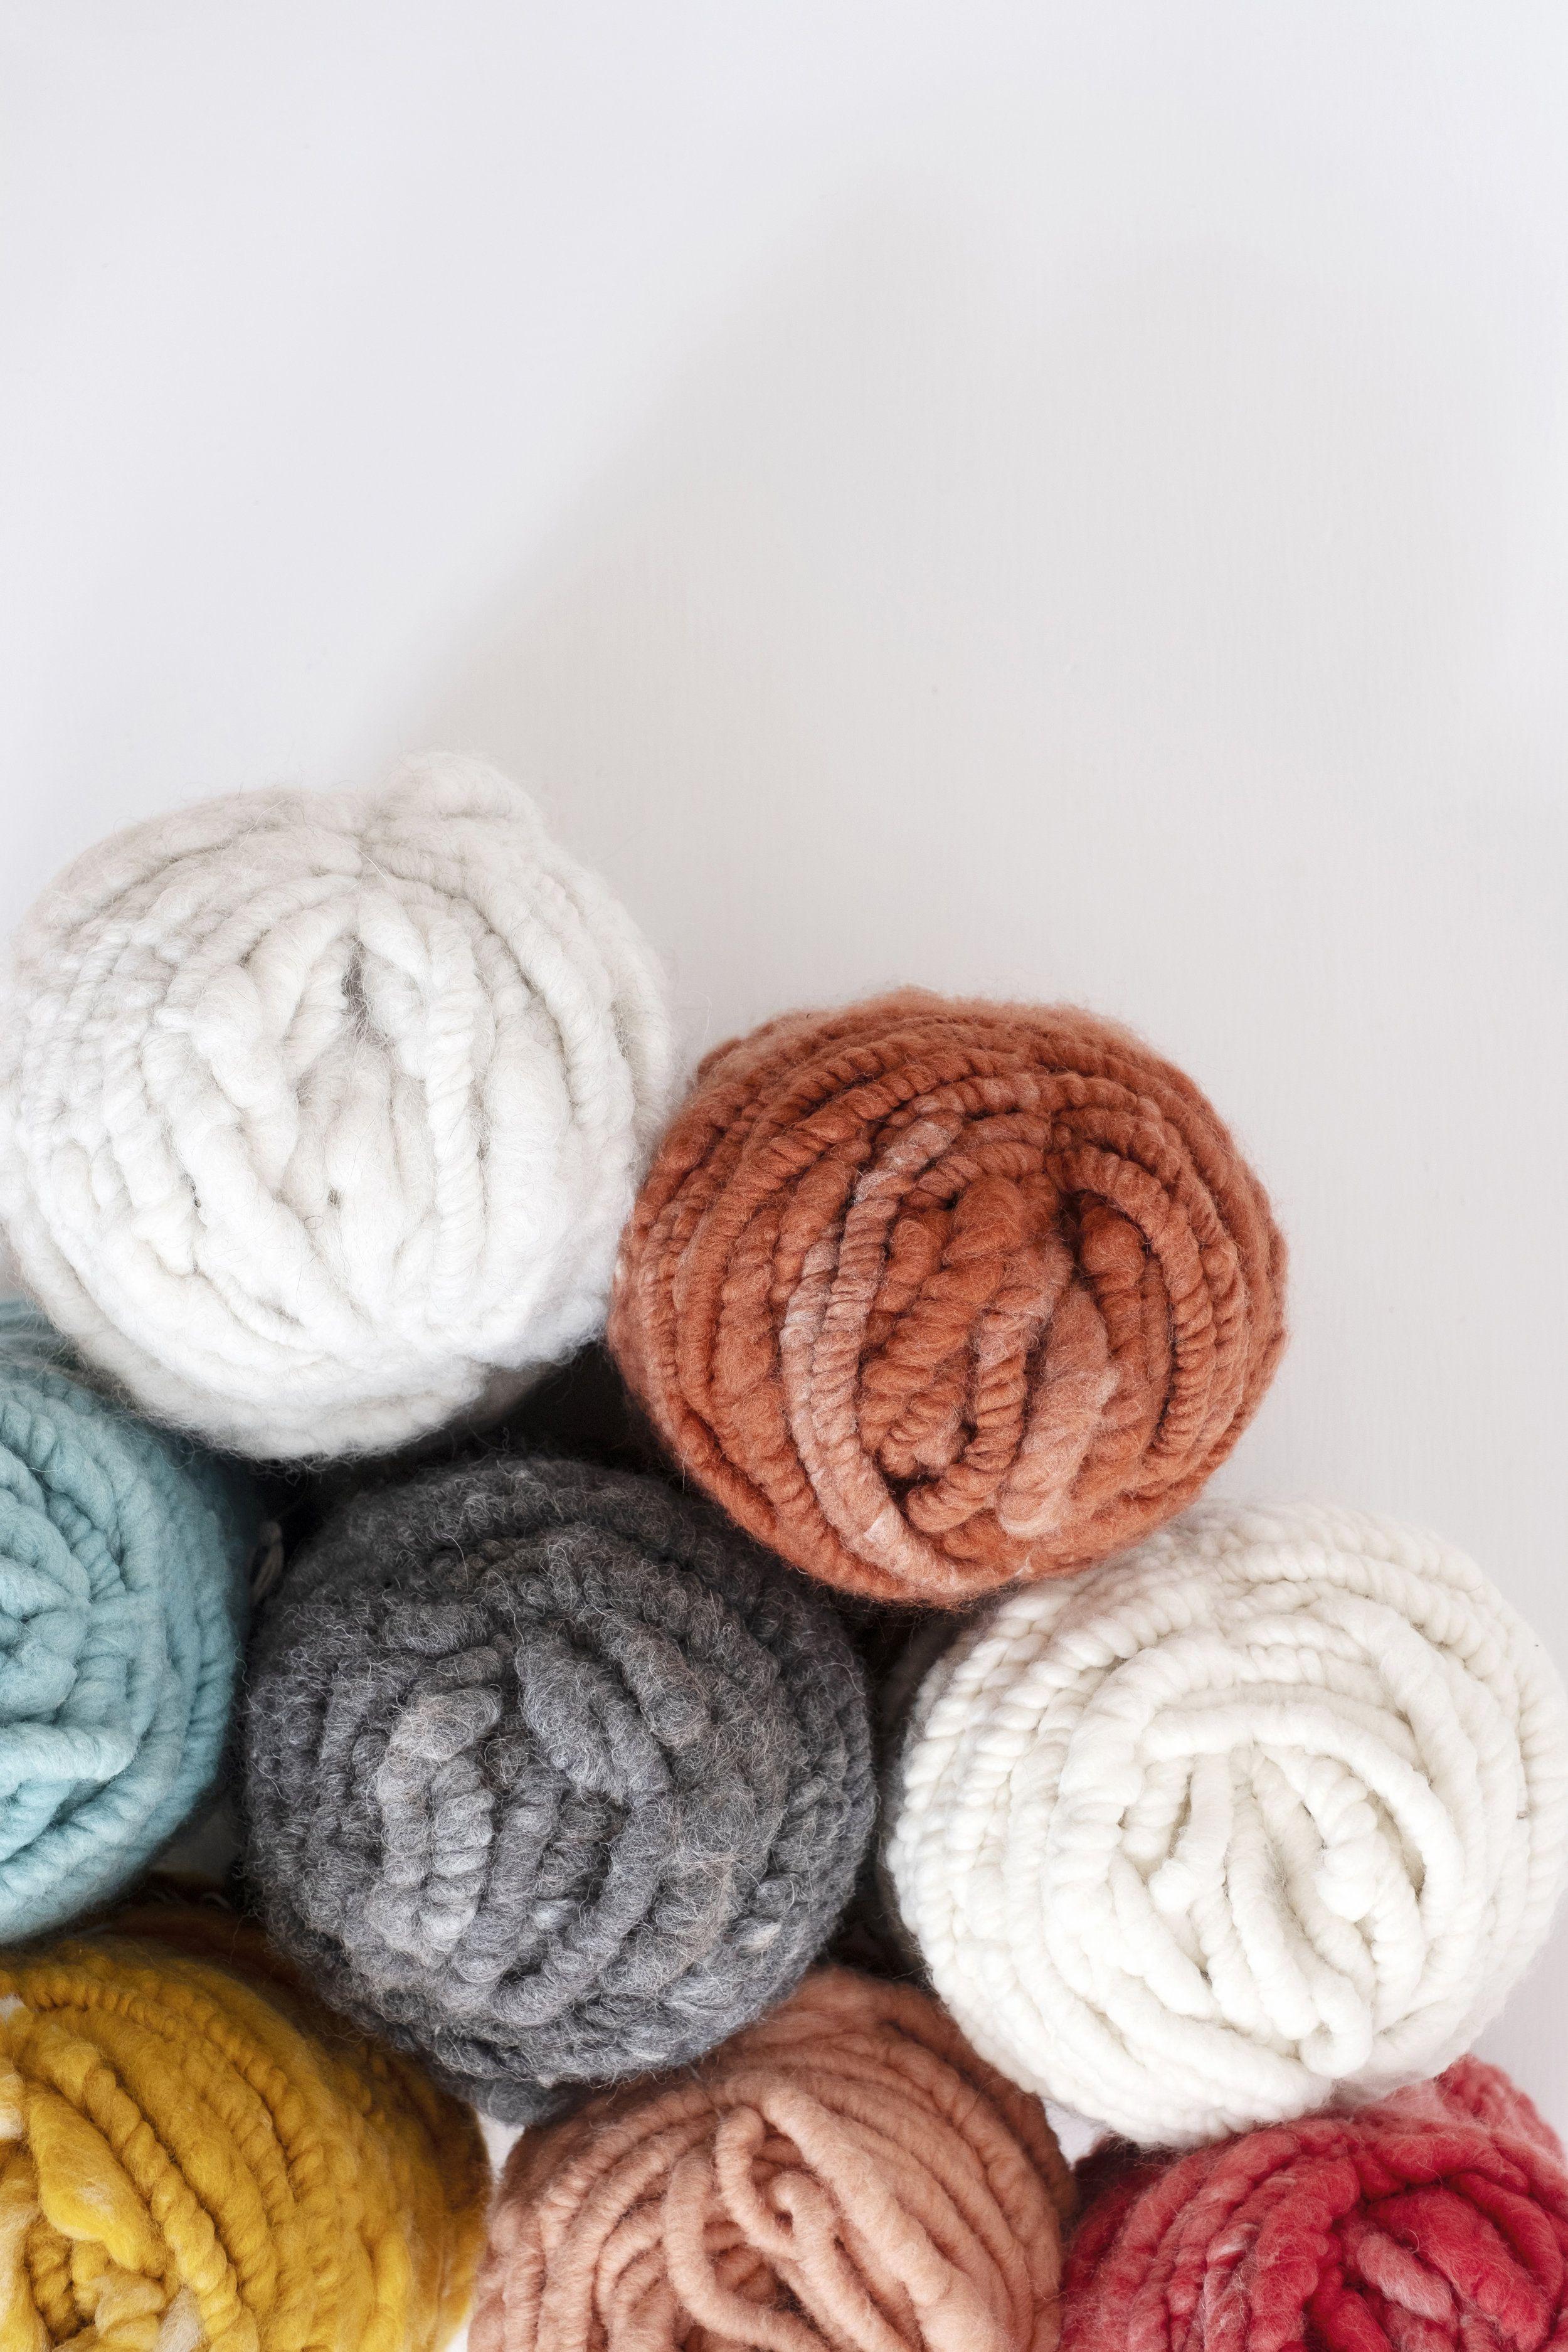 Rug Yarn Weaving Projects Knitting